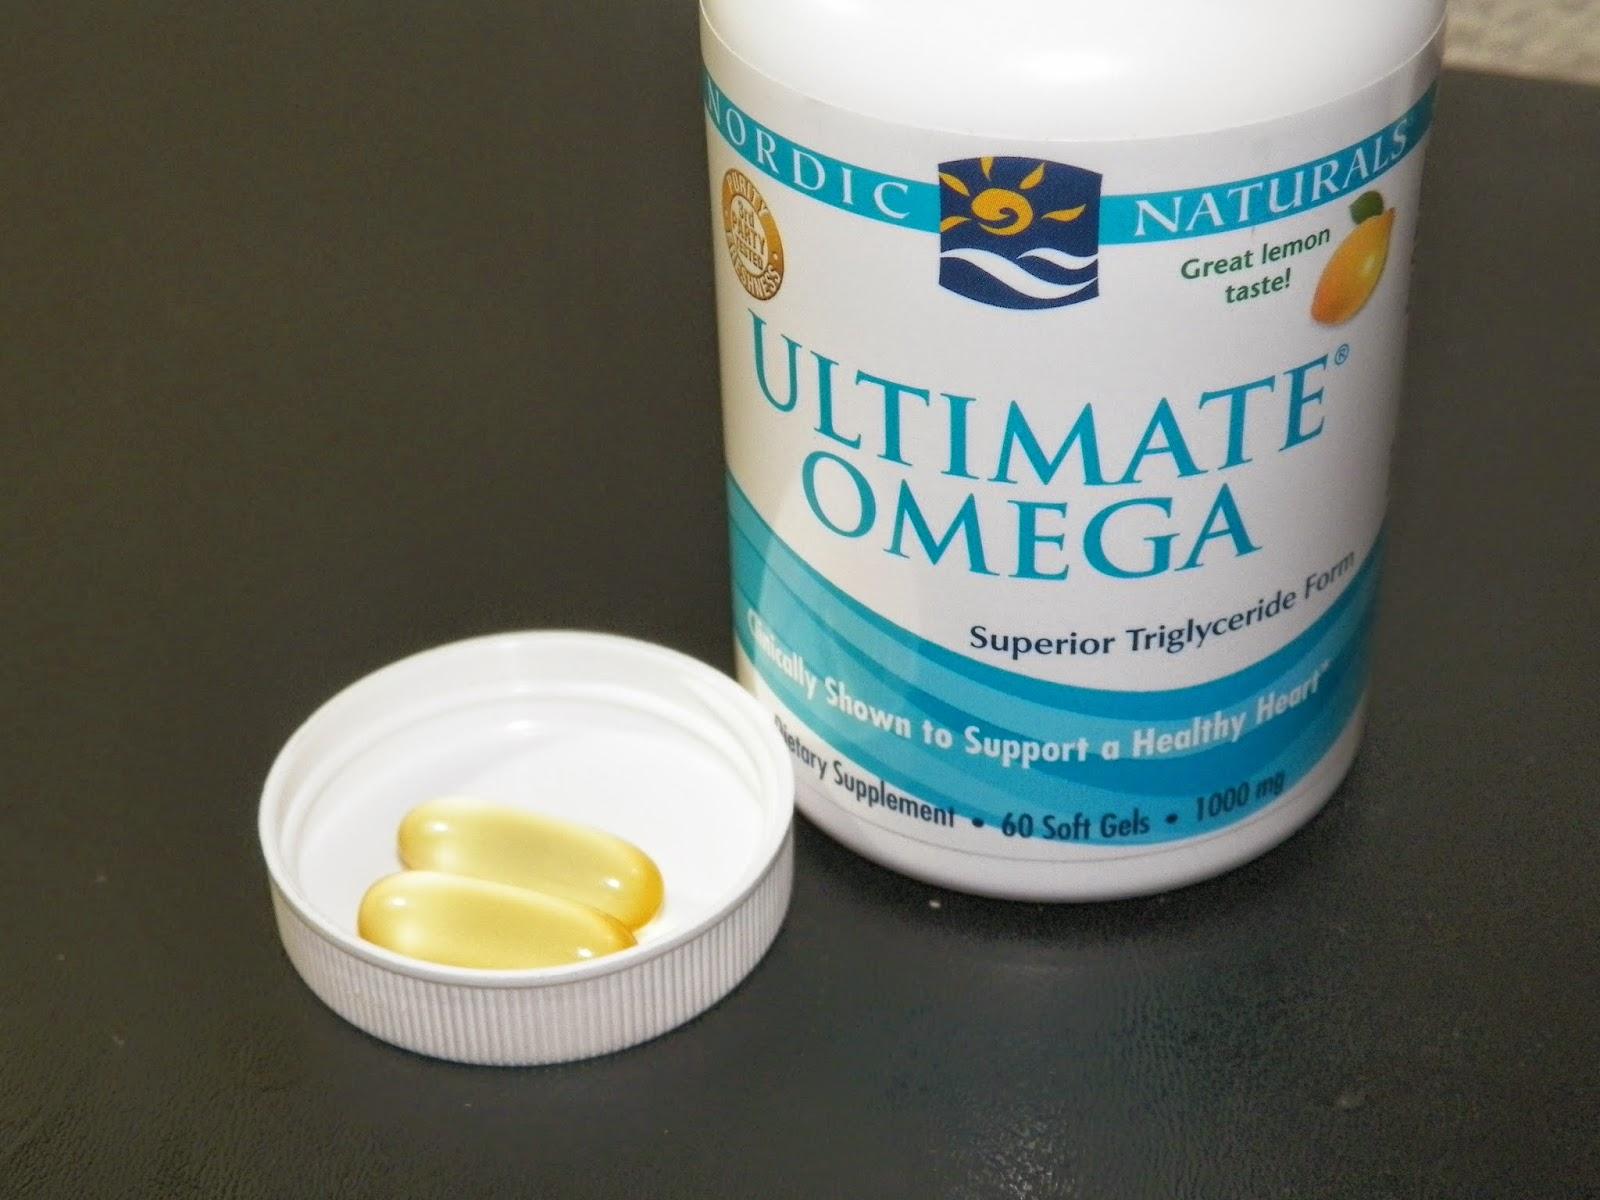 Nordic Naturals Ultimate Omega Mg Fish Oil